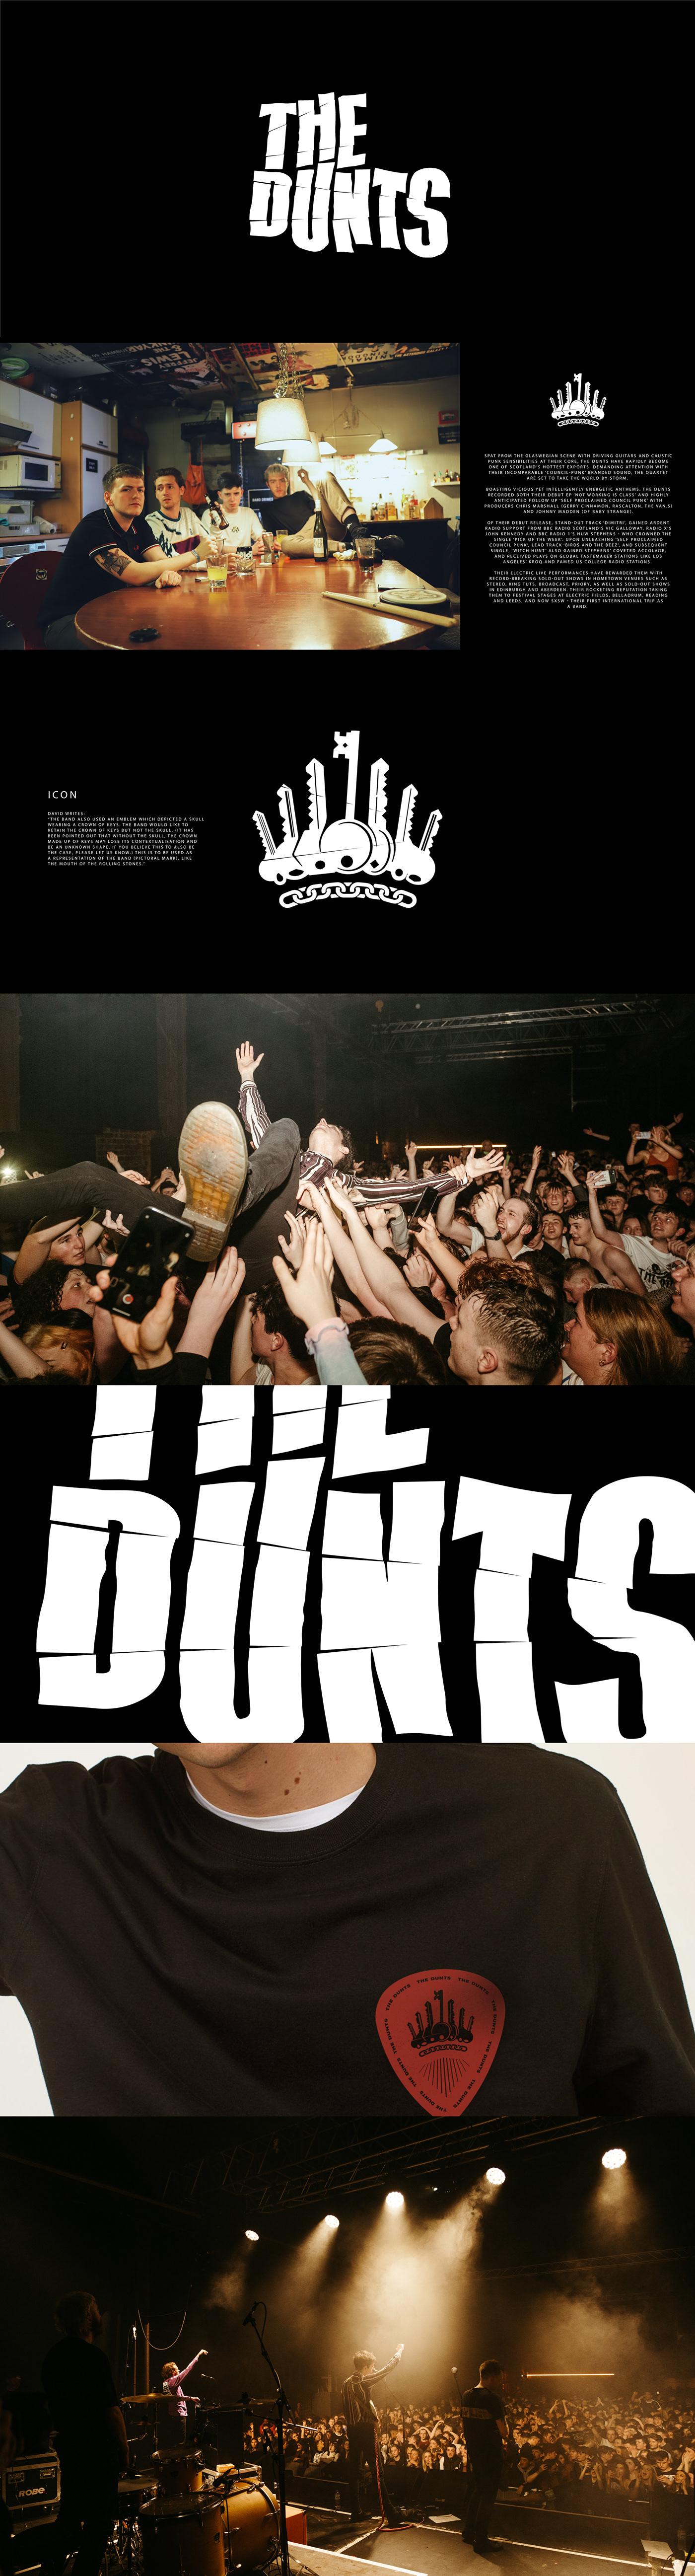 band branding  logo logos punk THE DUNTS music music band Music Branding music logo